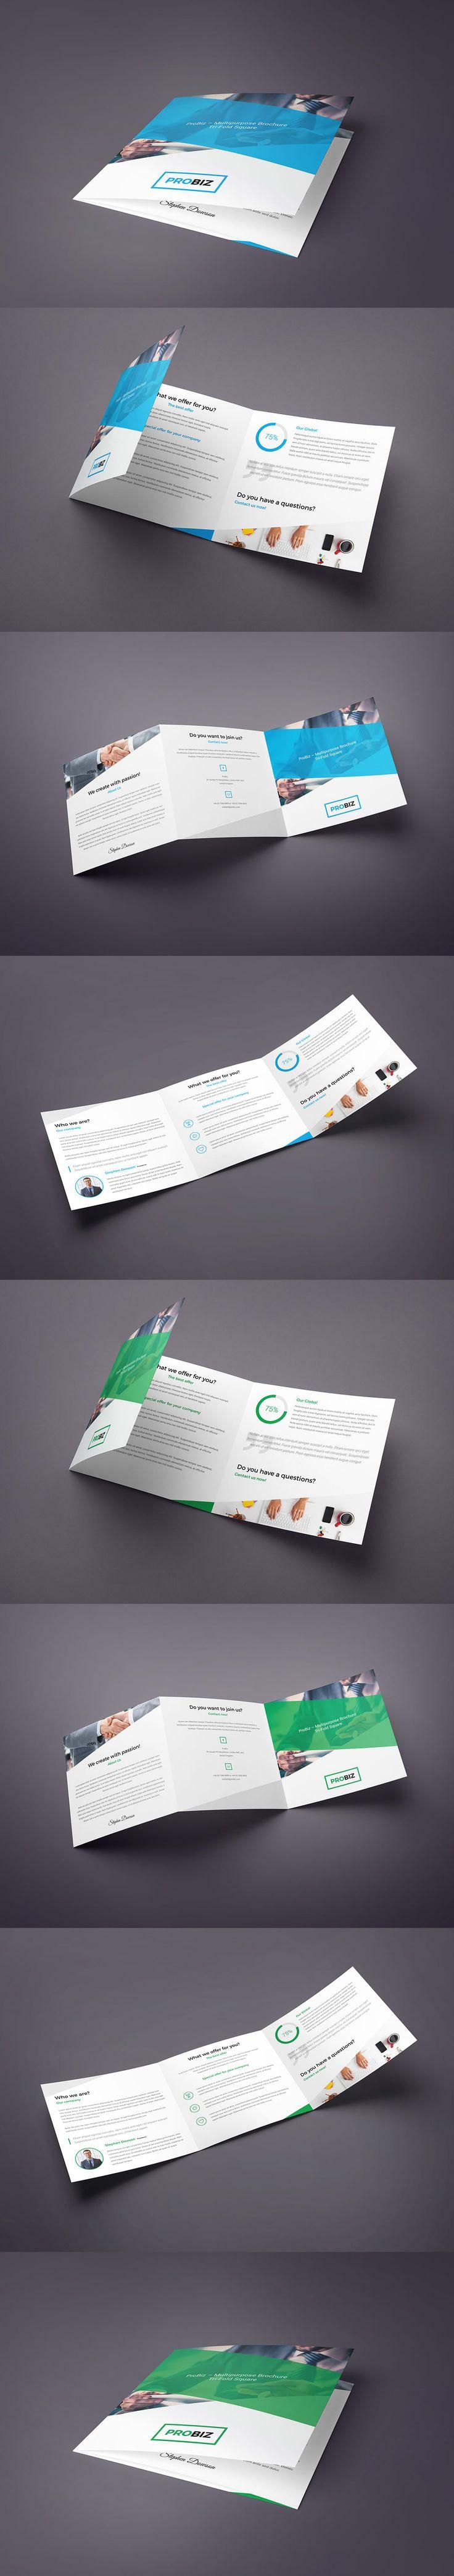 ProBiz – Tri-Fold Square Brochure Template PSD